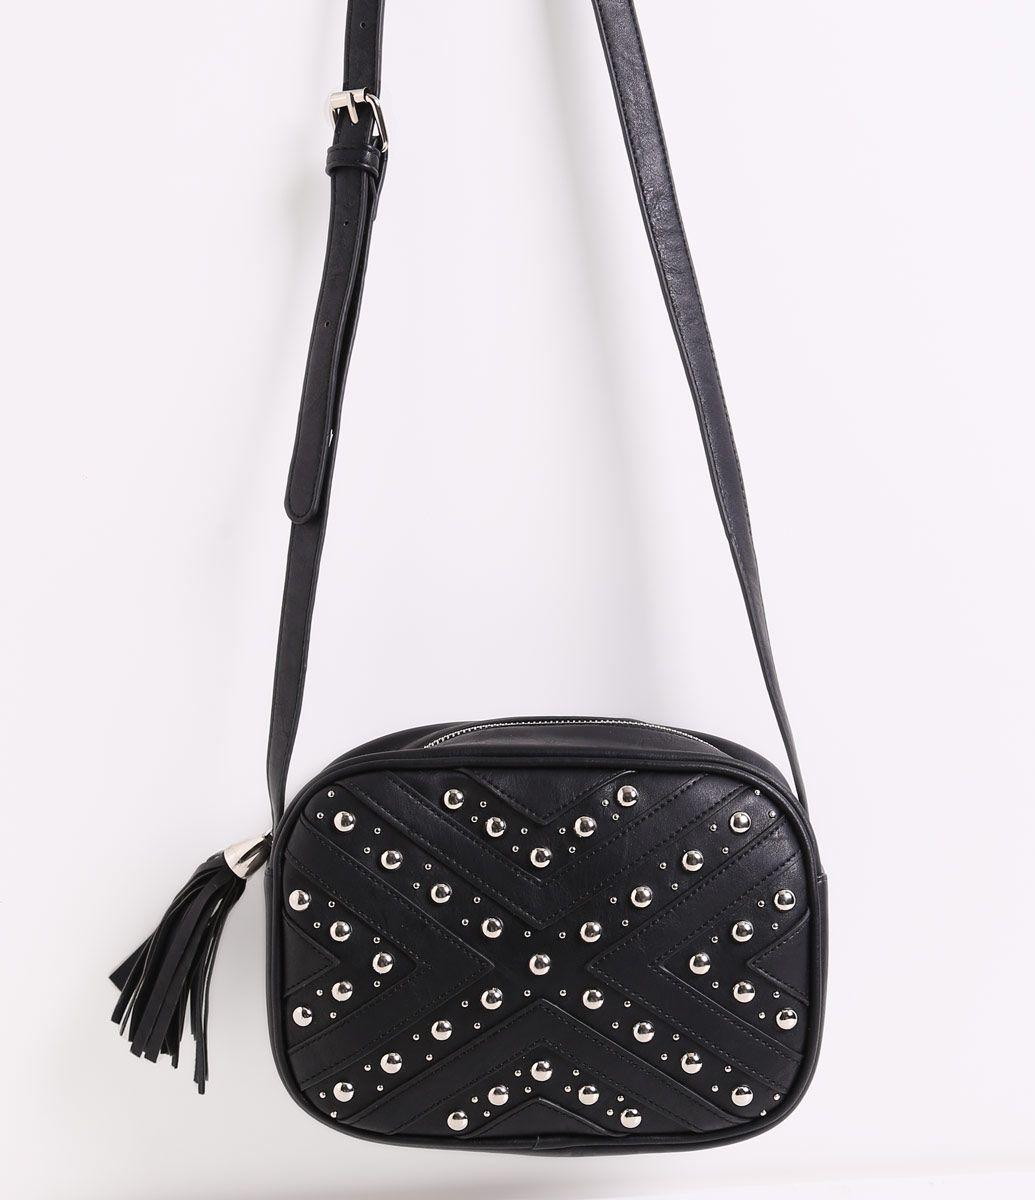 c6dbcc598 Bolsa Feminina Transversal com Rebites - Lojas Renner | Bags I like ...